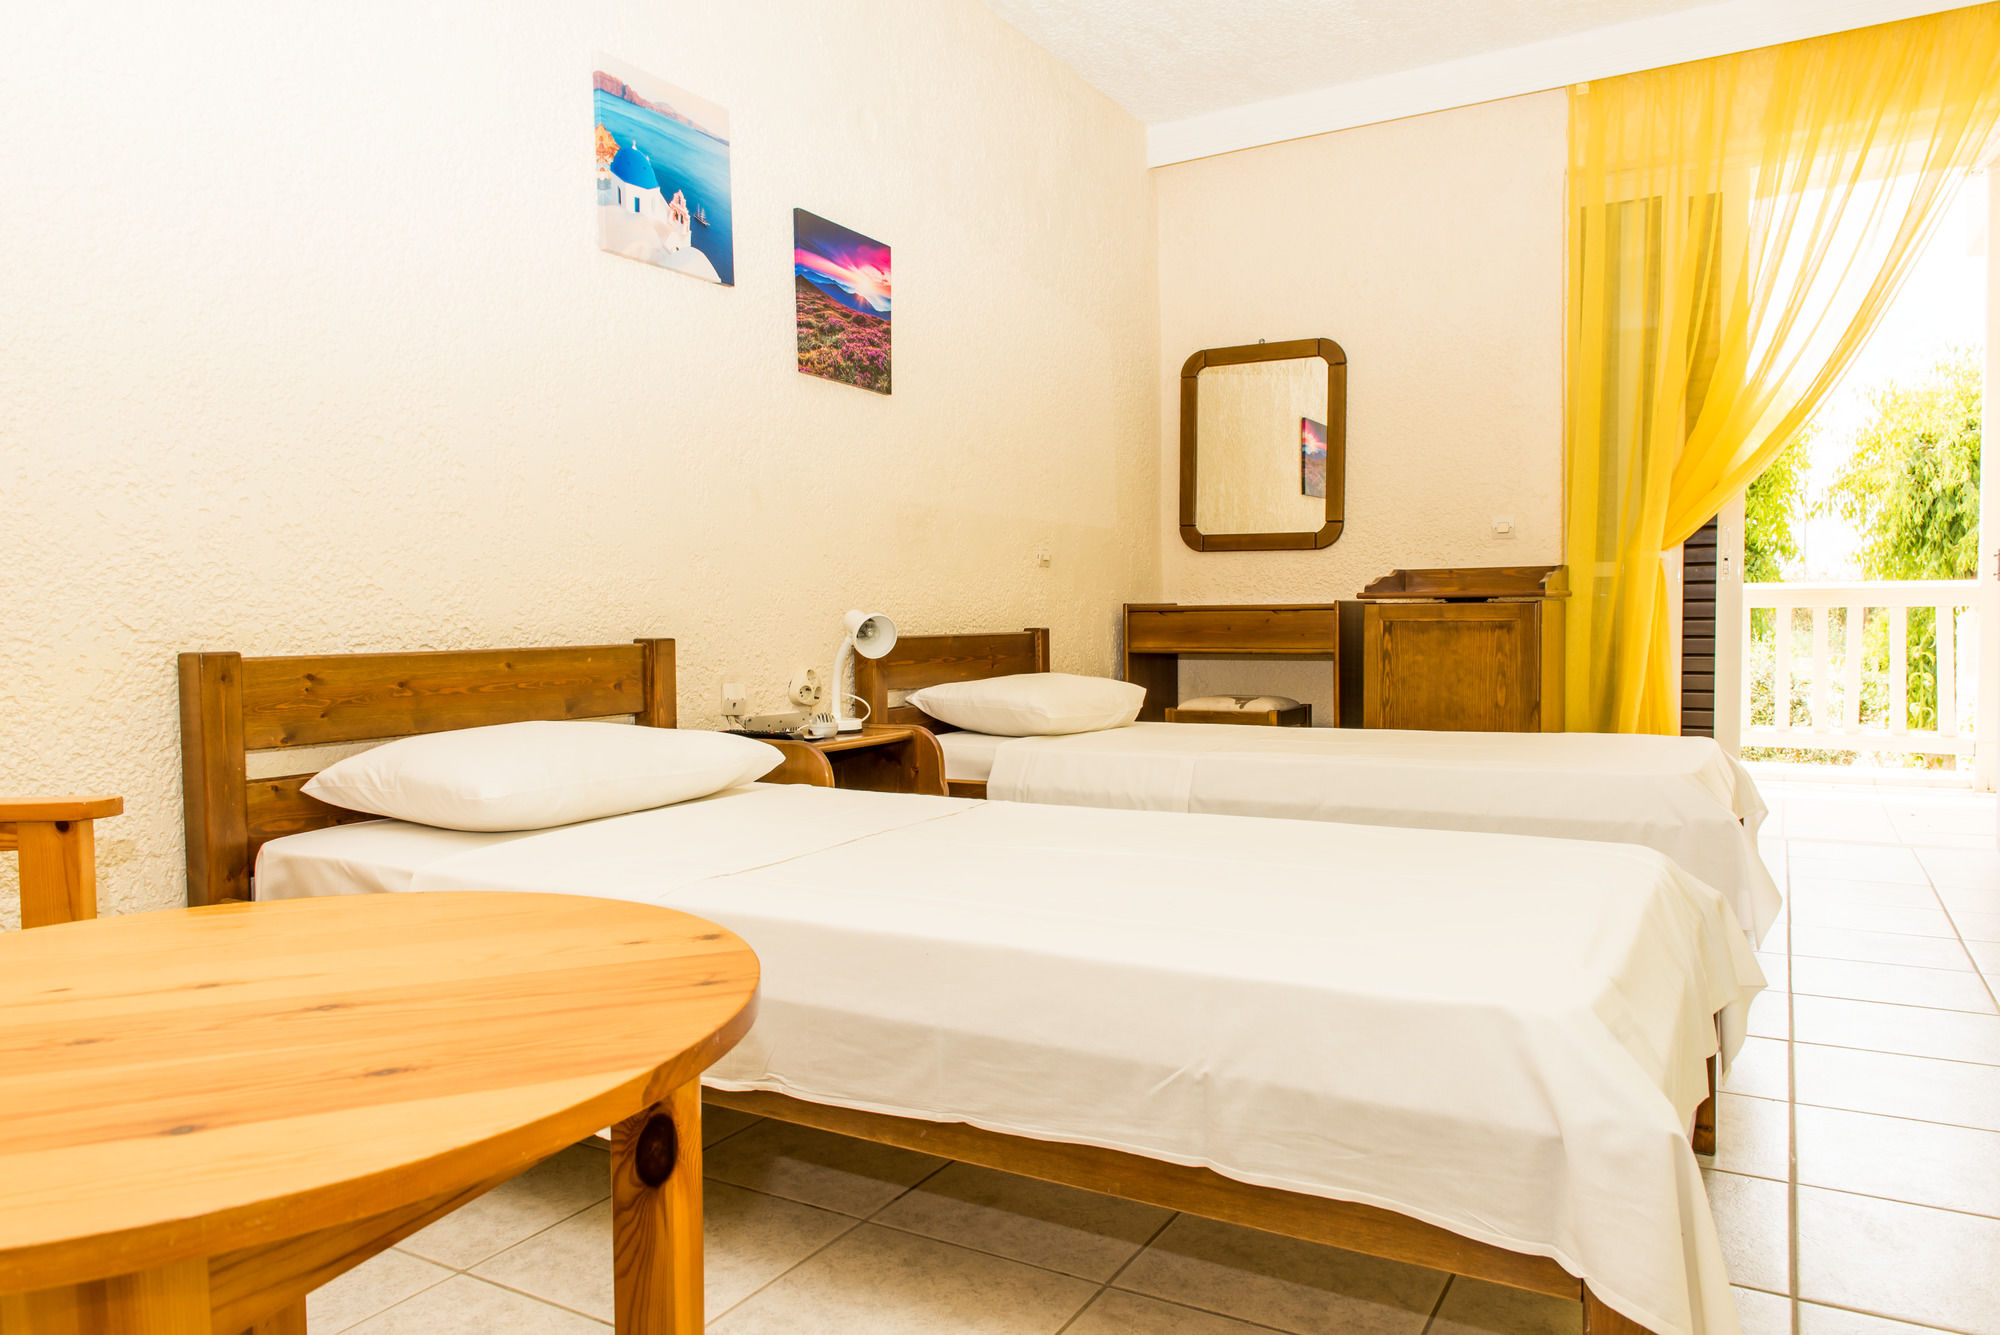 Vergina Hotel - Greece - Athens